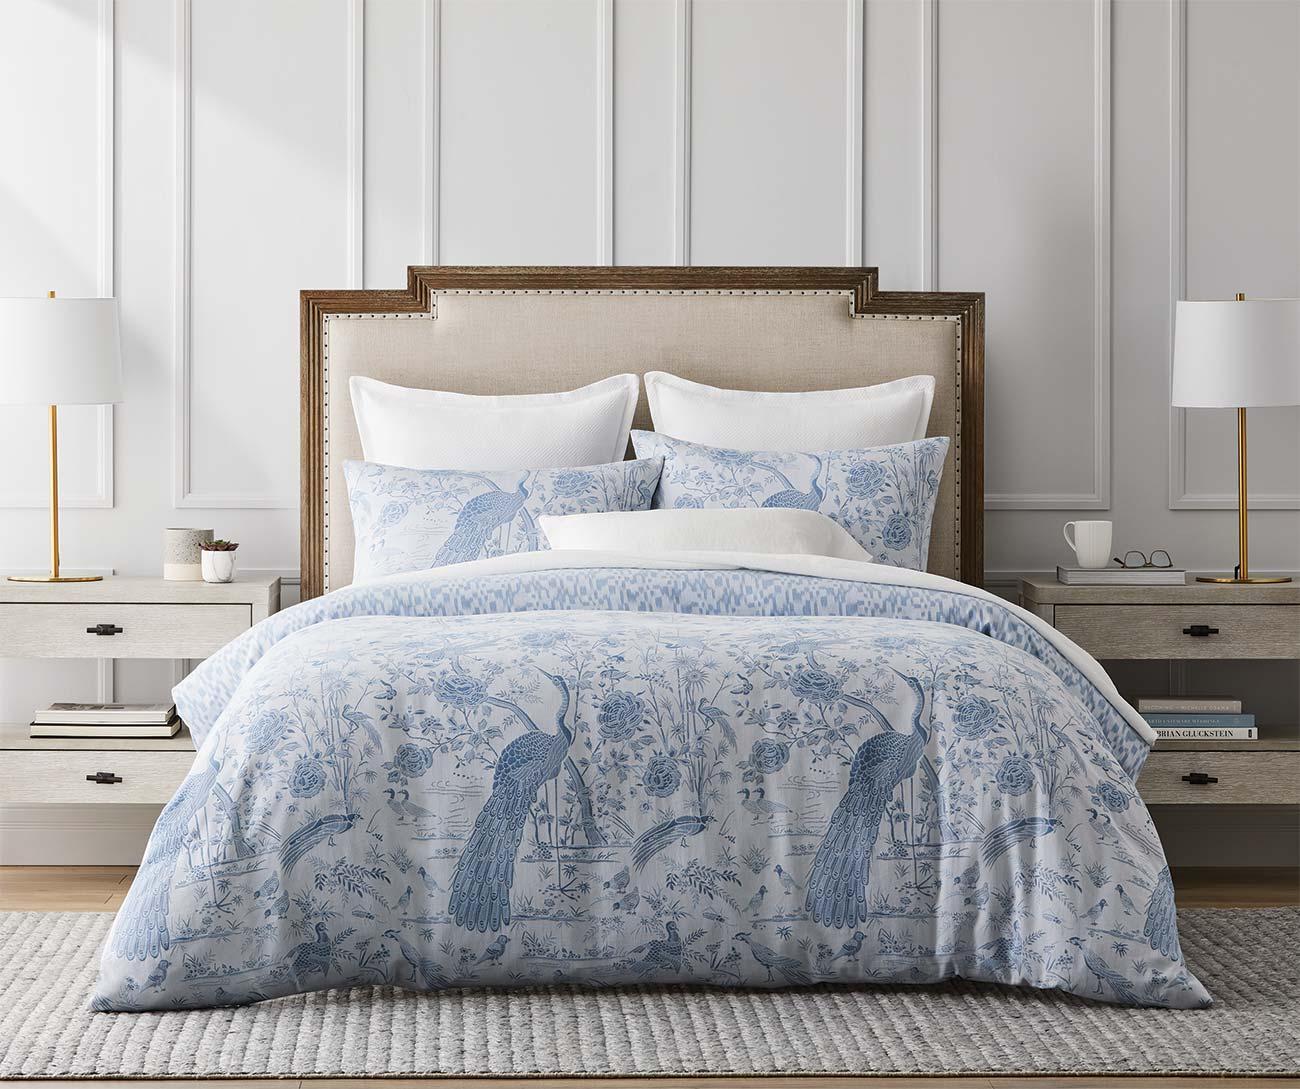 GlucksteinHome | A striking pattern in a fresh blue palette makes a luxuriously restful retreat